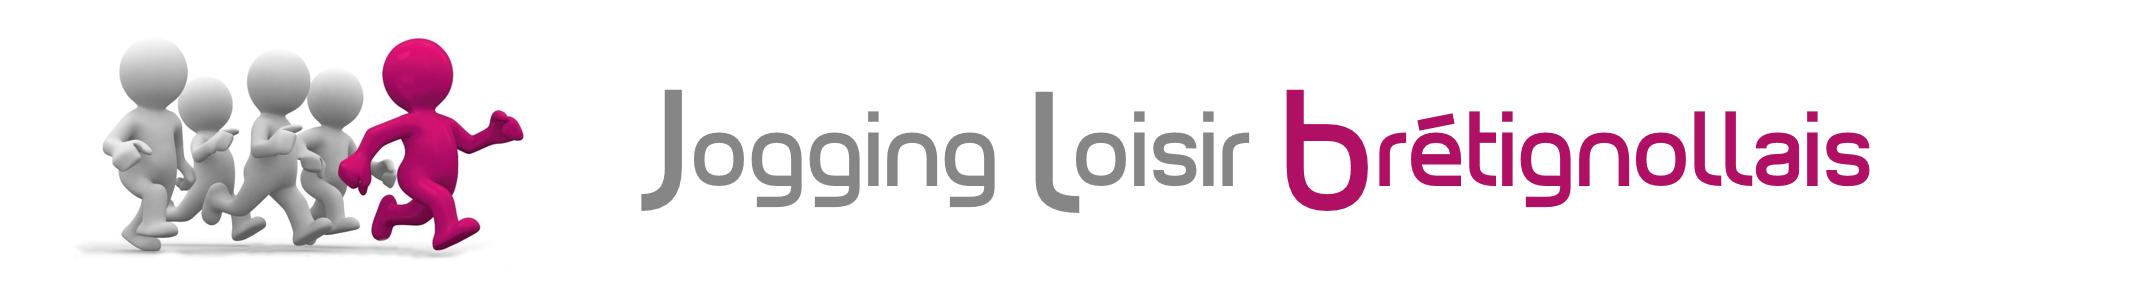 Jogging Loisir Brétignollais